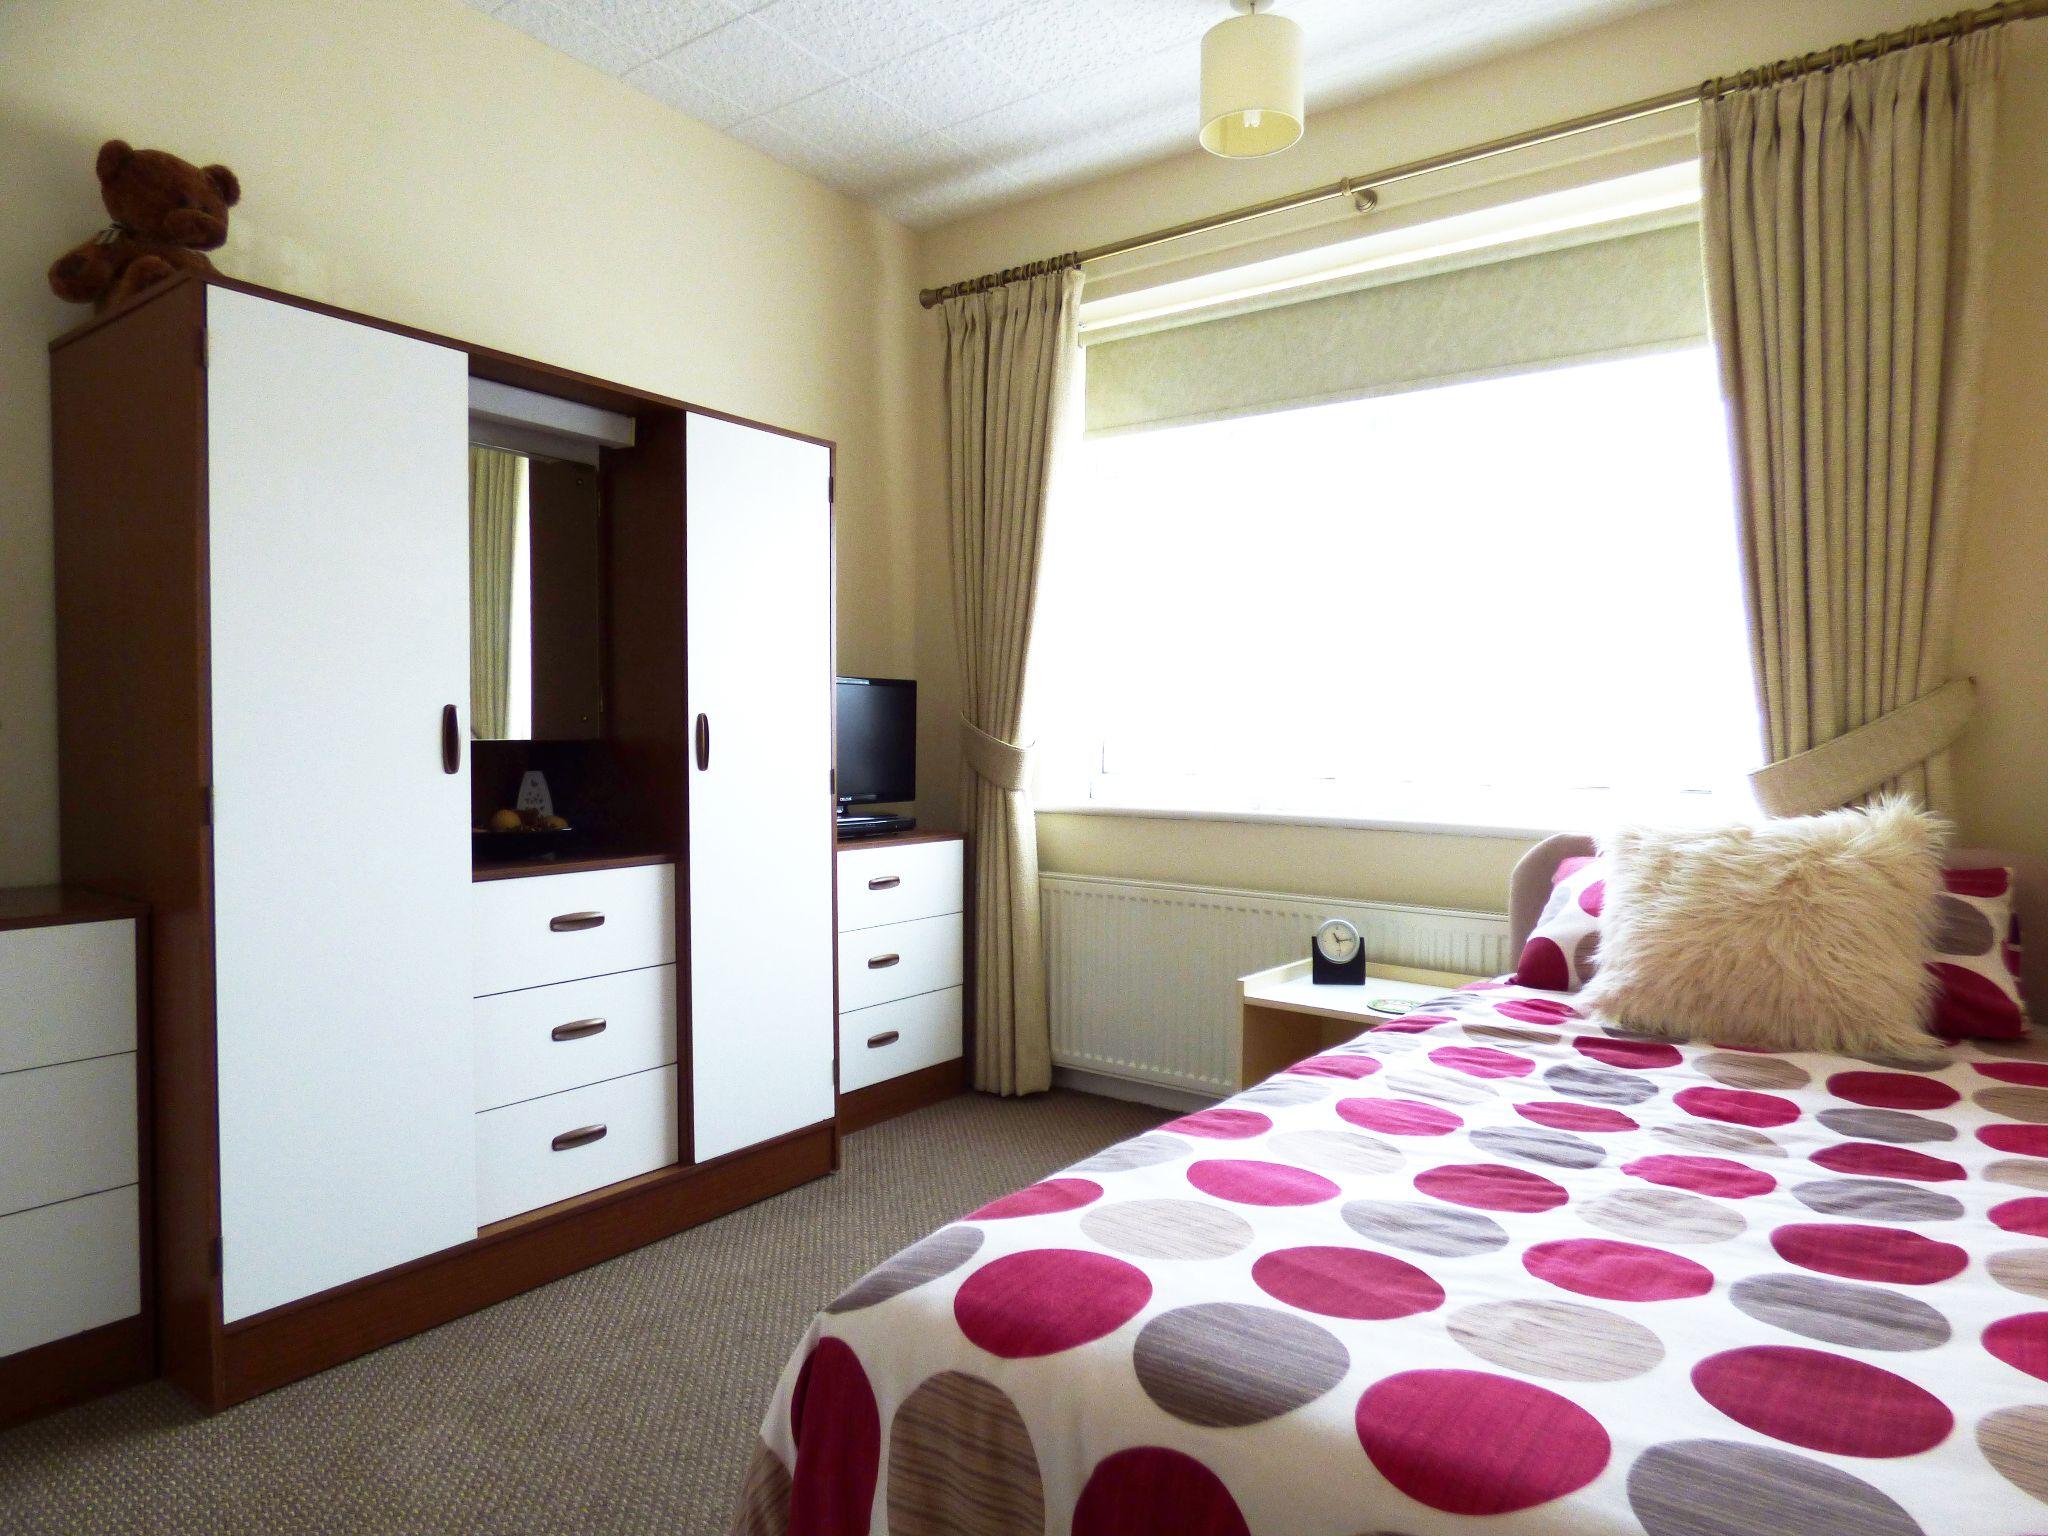 4 Bedroom Detached Bungalow For Sale - Bedroom Two